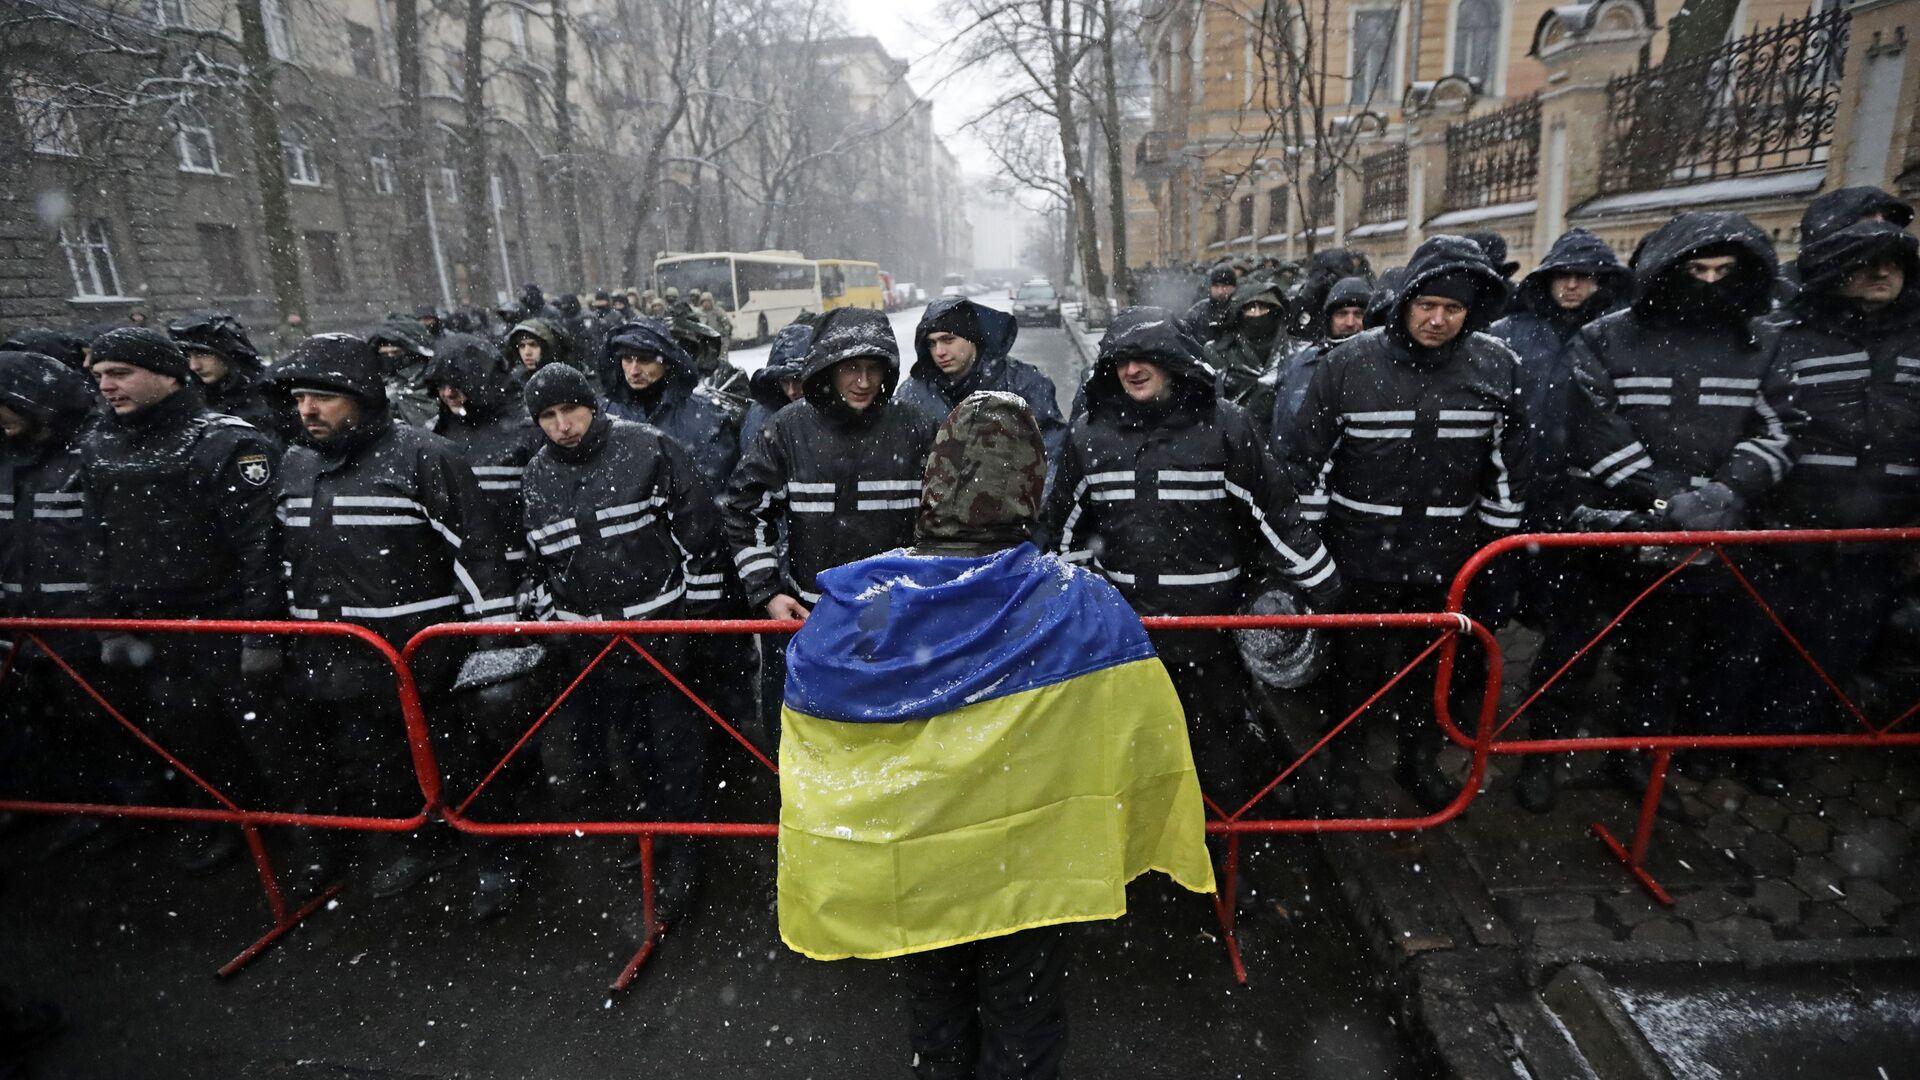 Участник акции протеста в Киеве - РИА Новости, 1920, 11.11.2019